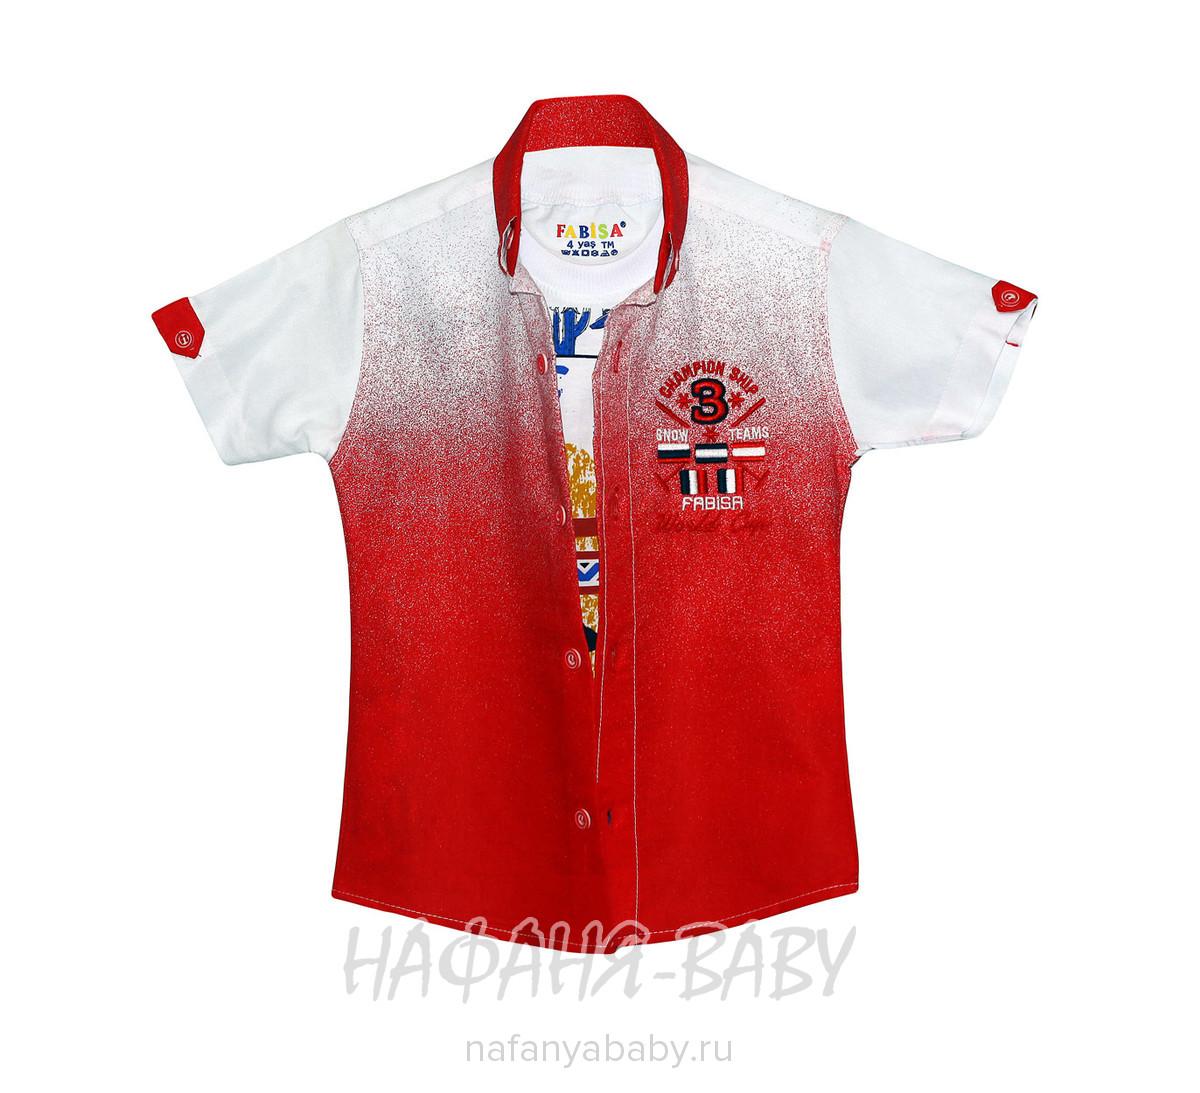 Детская рубашка+майка FABISA арт: 118 1-4, 1-4 года, оптом Турция